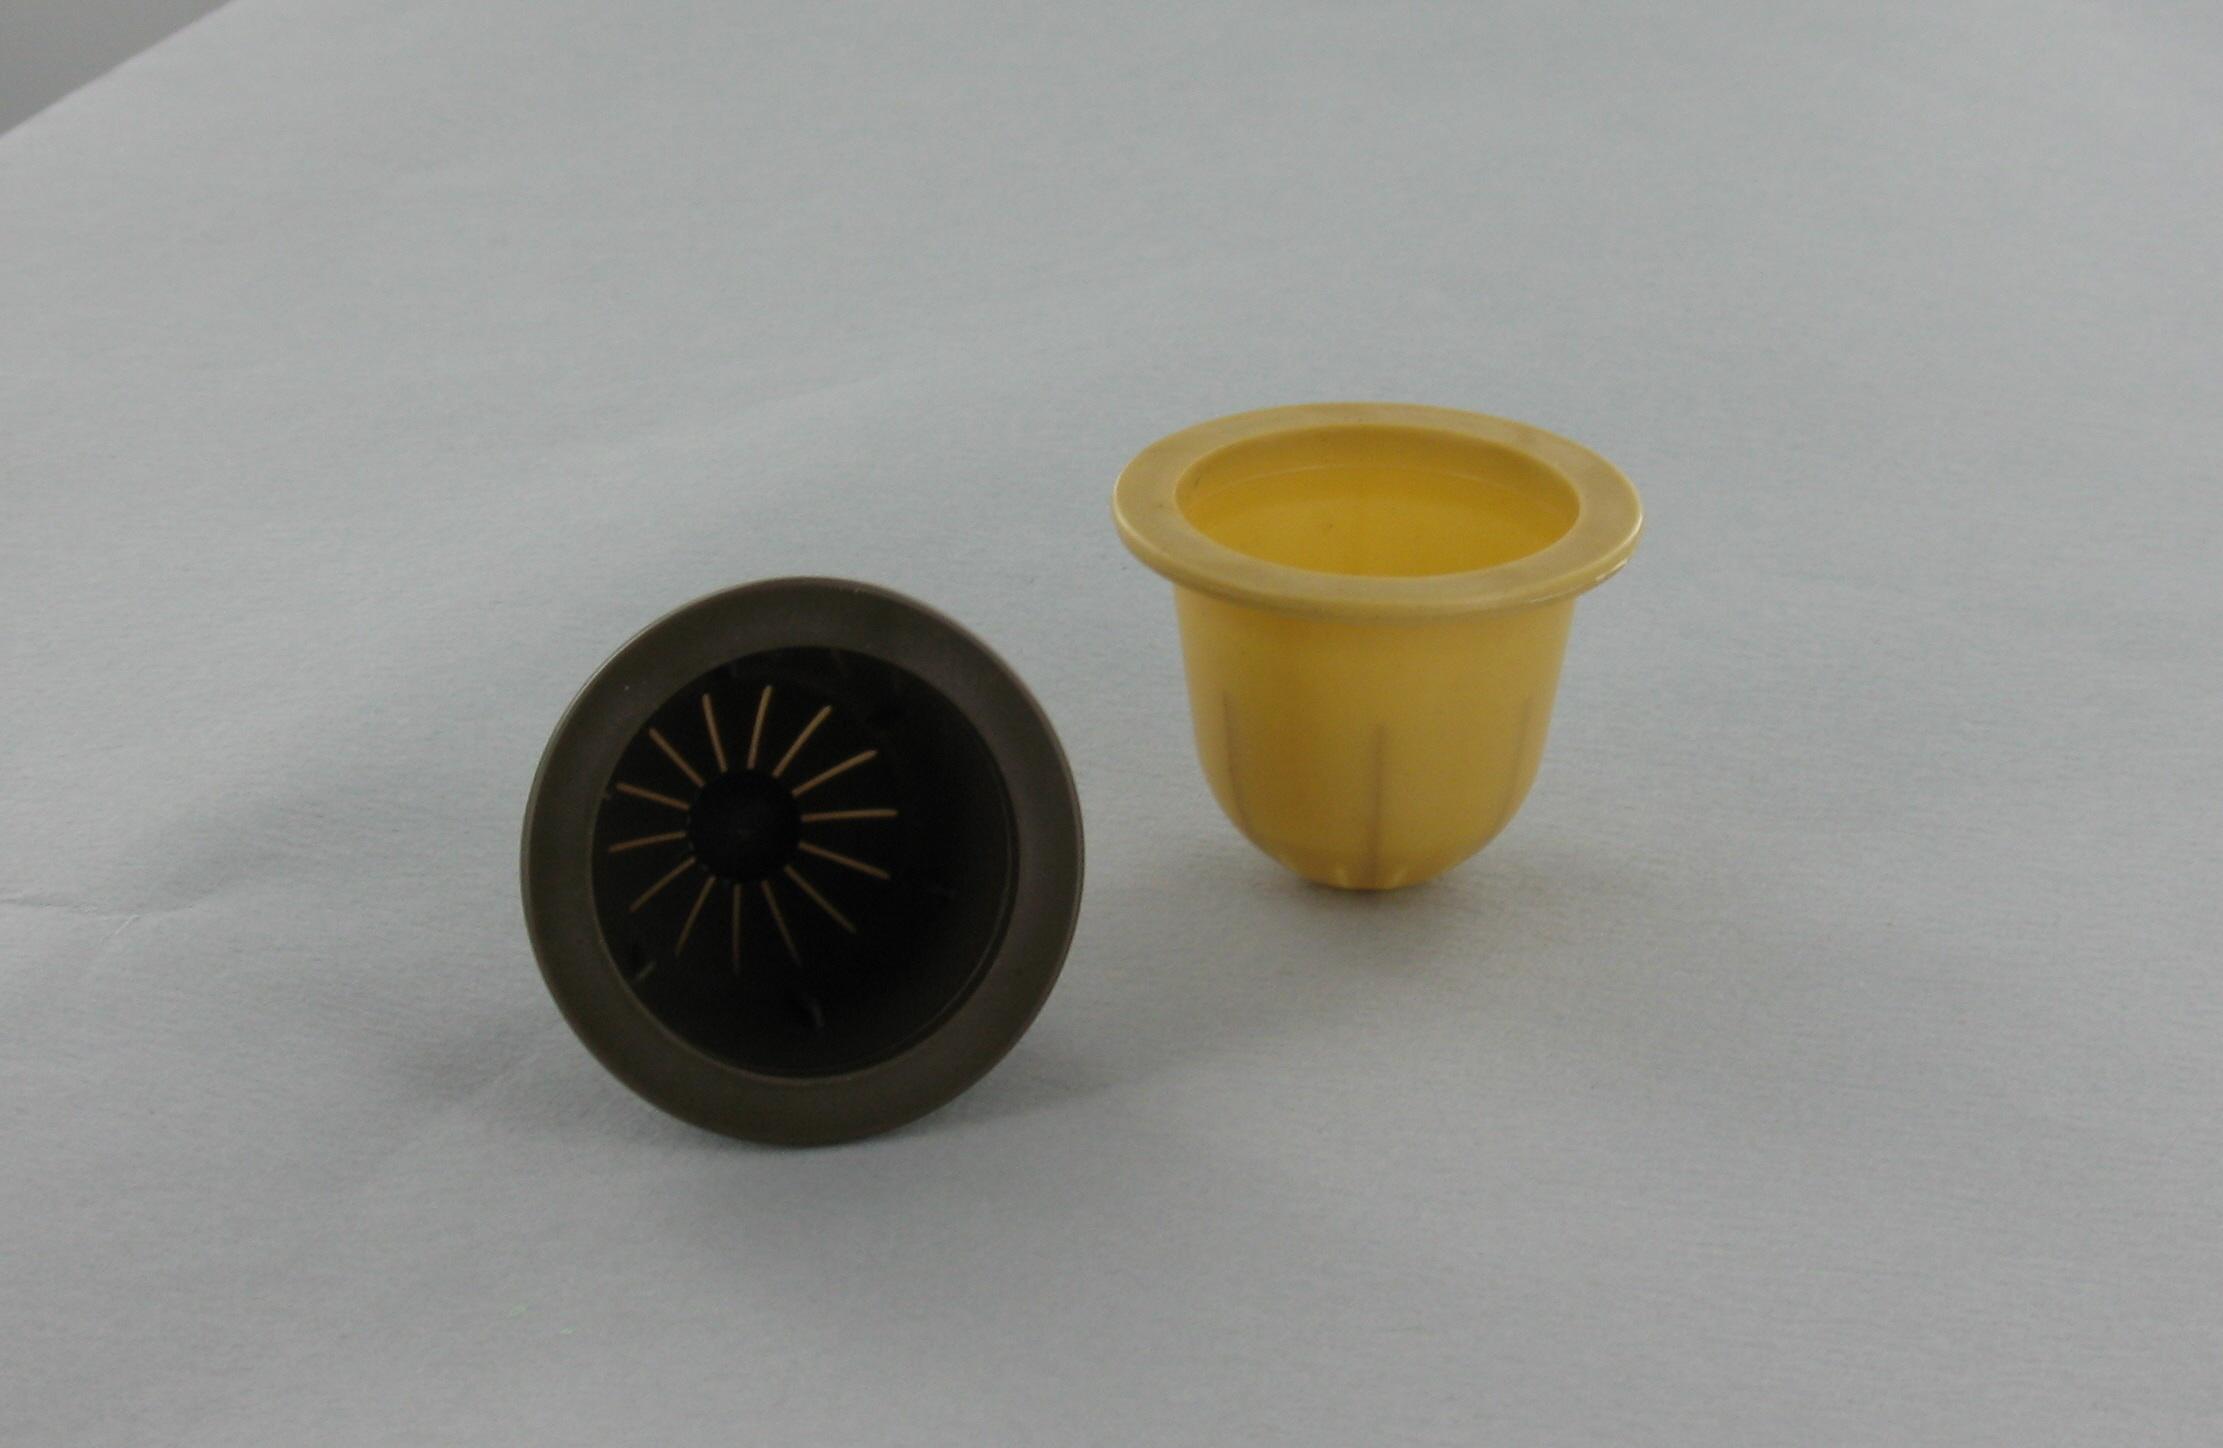 achat capsule vide compatible nespresso. Black Bedroom Furniture Sets. Home Design Ideas